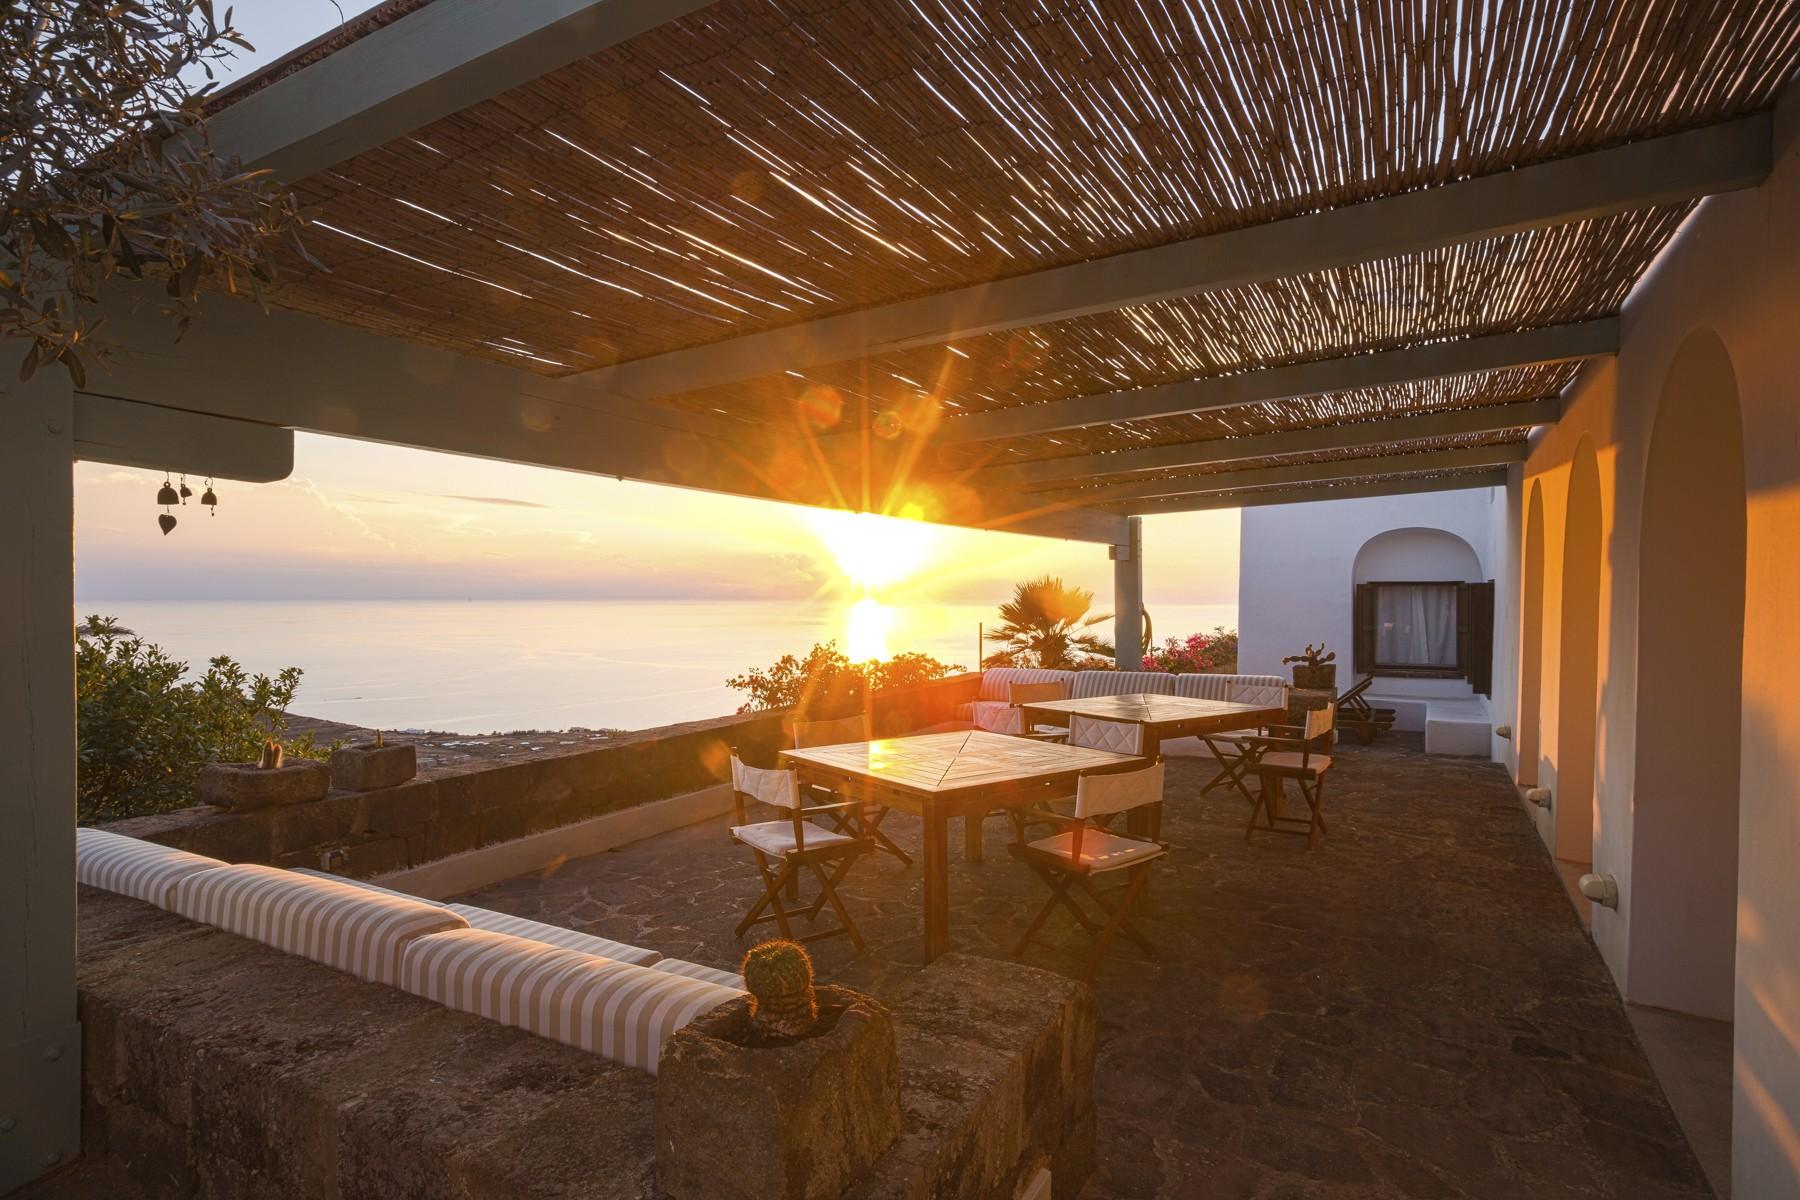 Villa in Vendita a Pantelleria: 5 locali, 530 mq